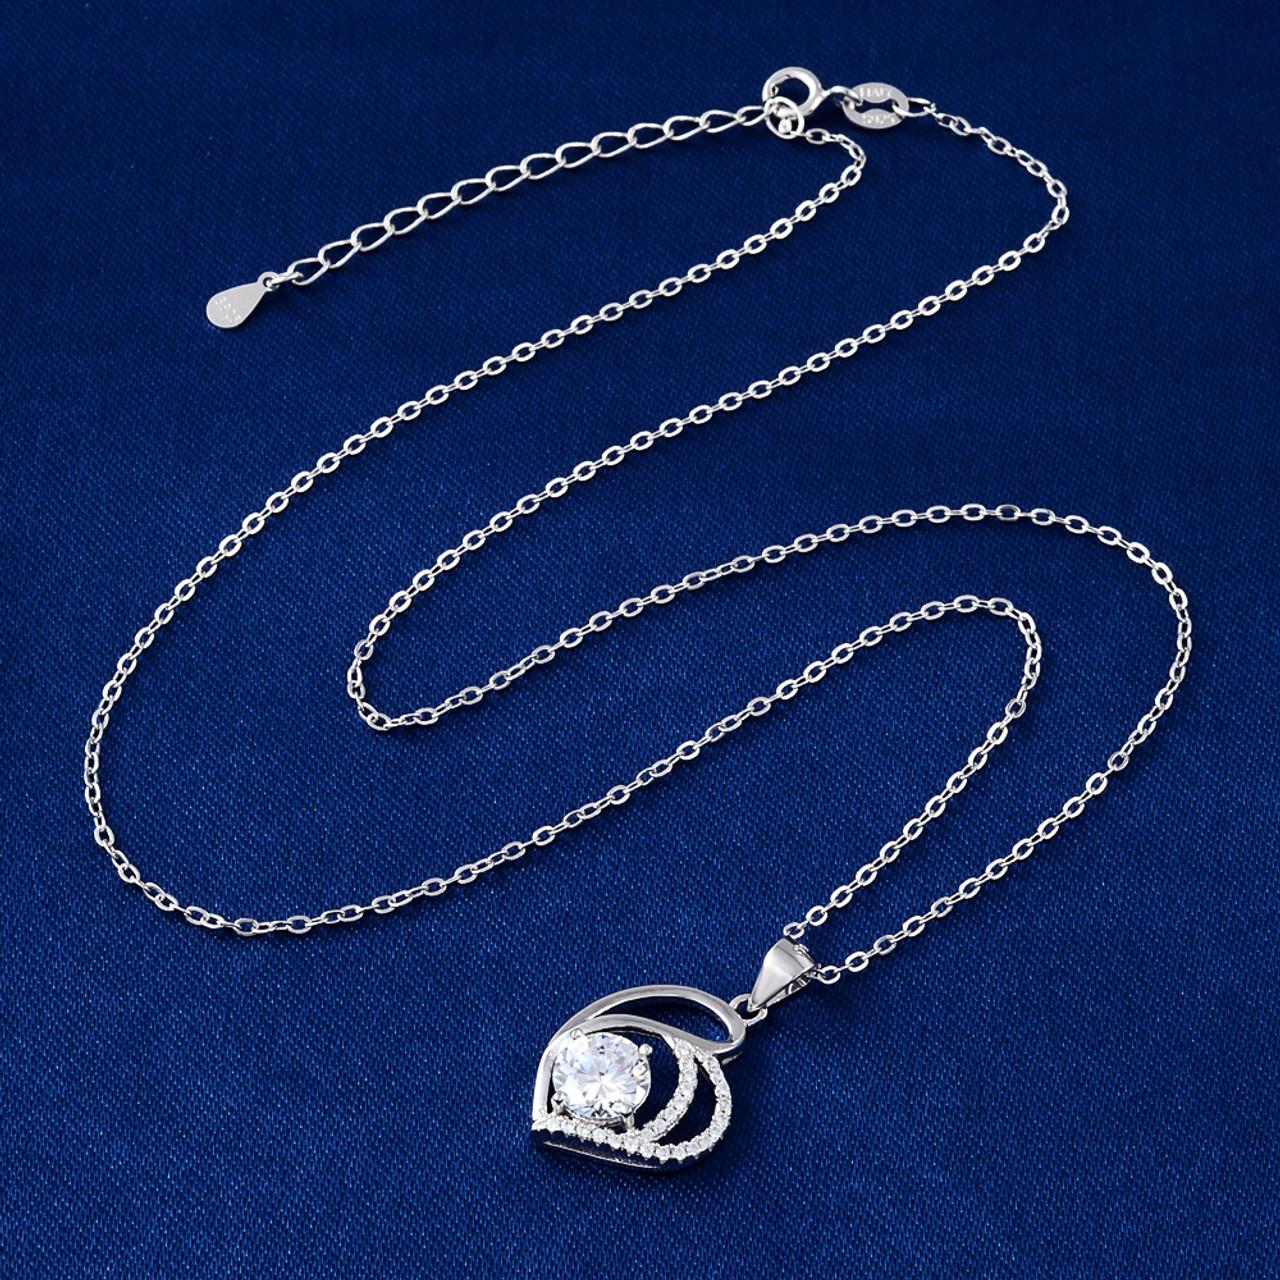 925 sterling silver necklace aaa zircon crystal love pendant silver 925 sterling silver necklace aaa zircon crystal love pendant silver chain woman jewelry fashion aloadofball Gallery